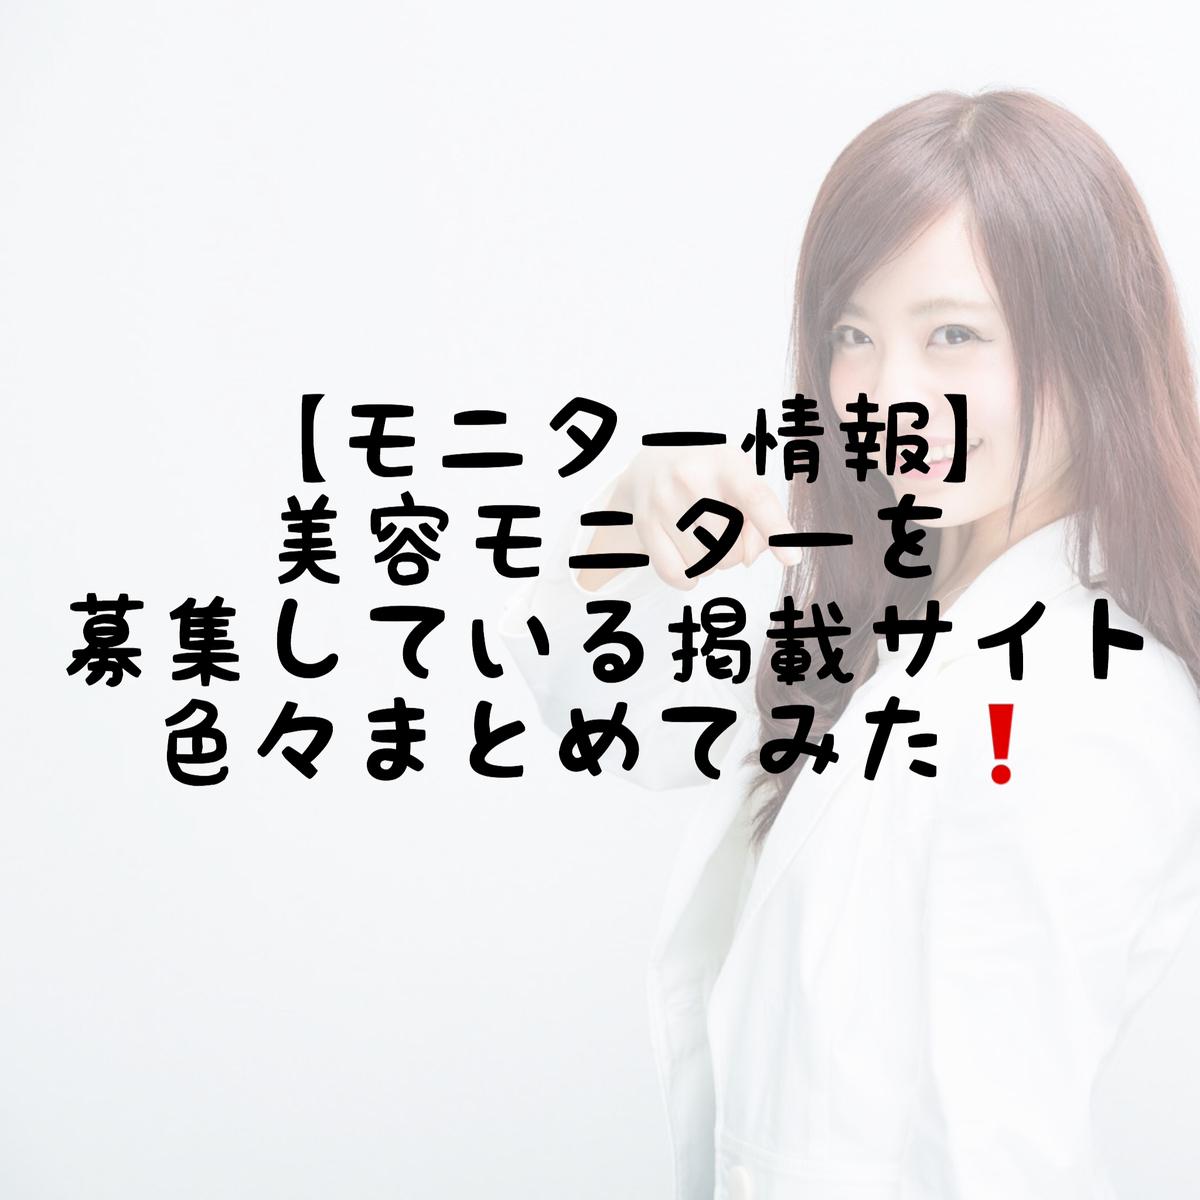 f:id:nokonoko_o:20200608182637j:plain